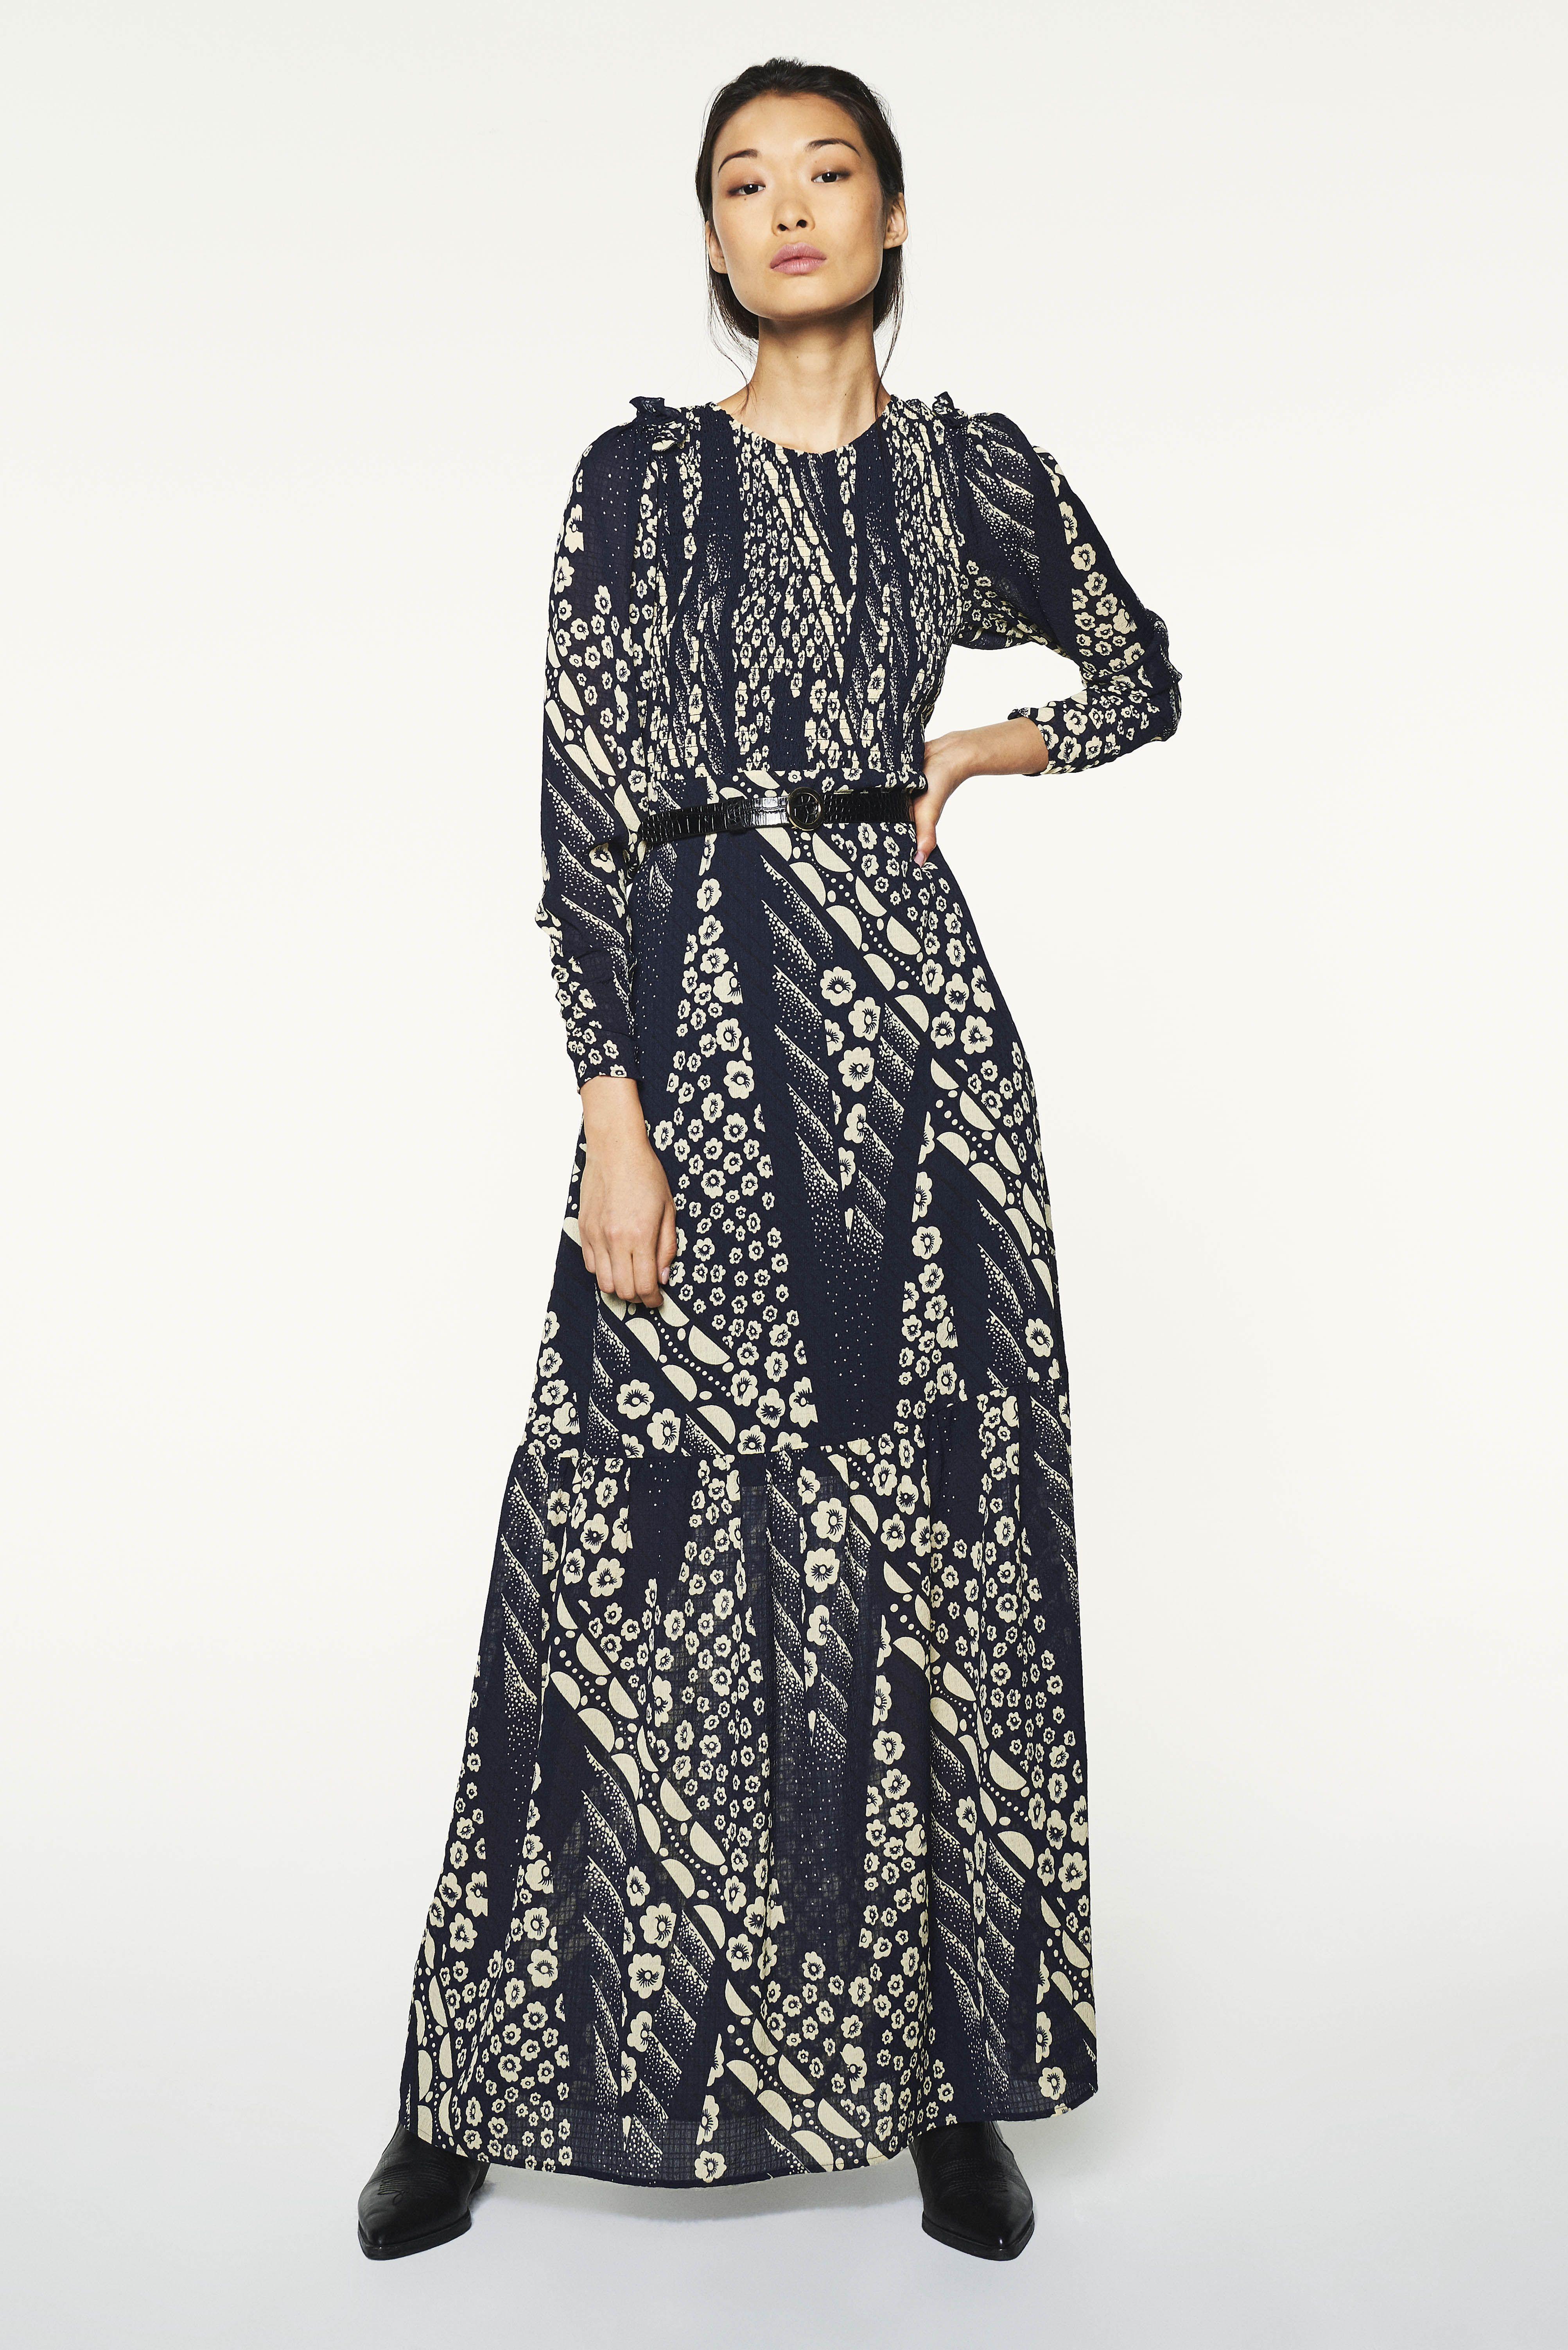 32+ Bash dress ideas